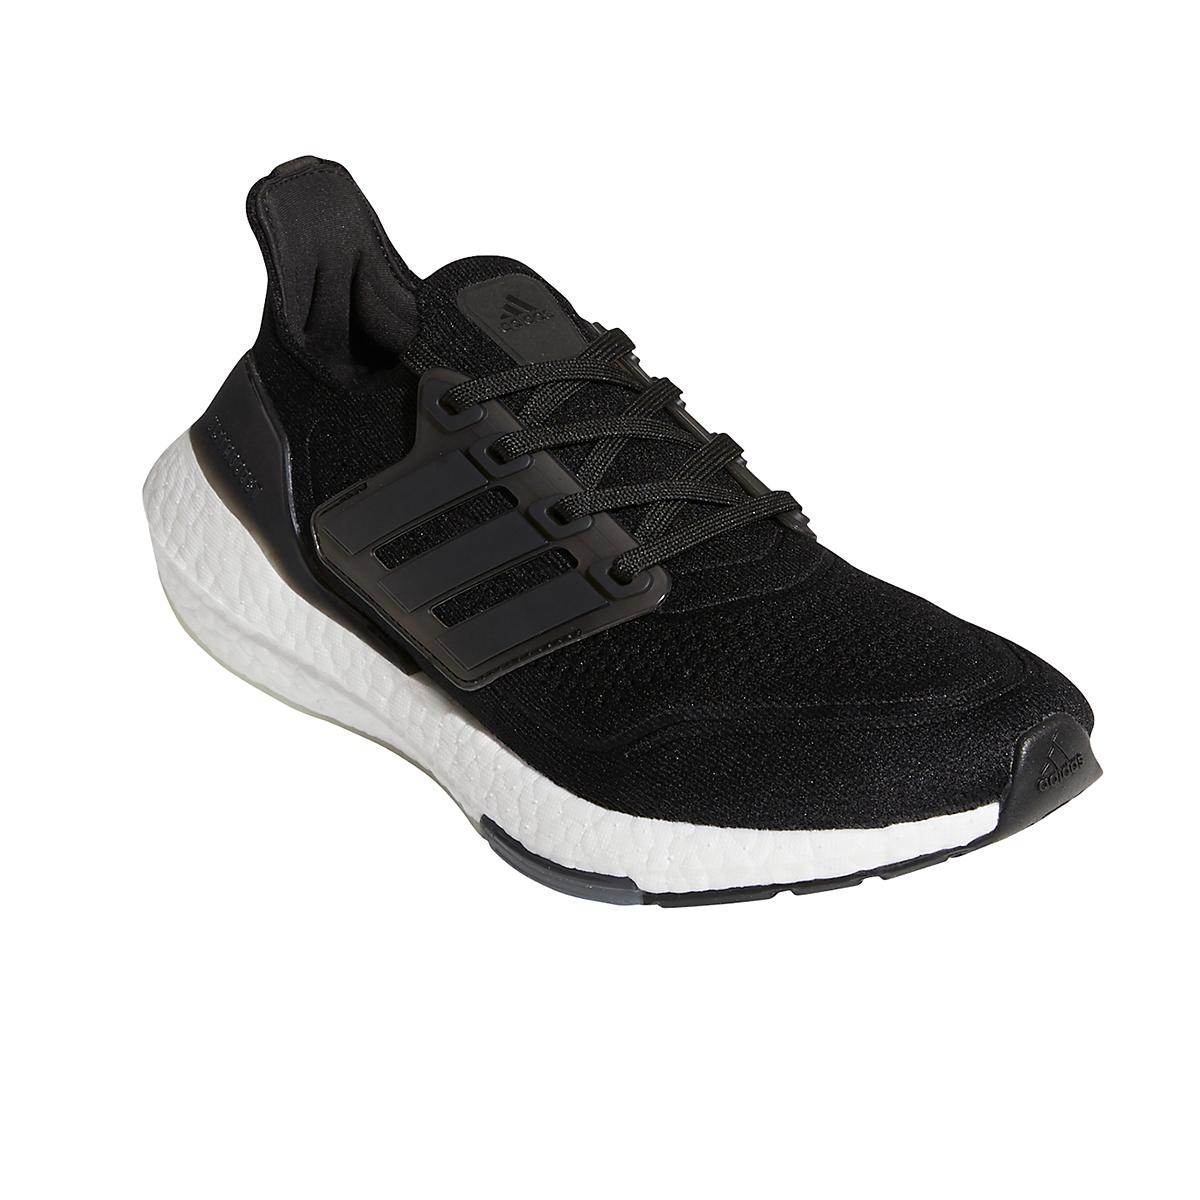 Women's Adidas Ultraboost 21 Running Shoe - Color: Core Black/Grey - Size: 5 - Width: Regular, Core Black/Grey, large, image 3